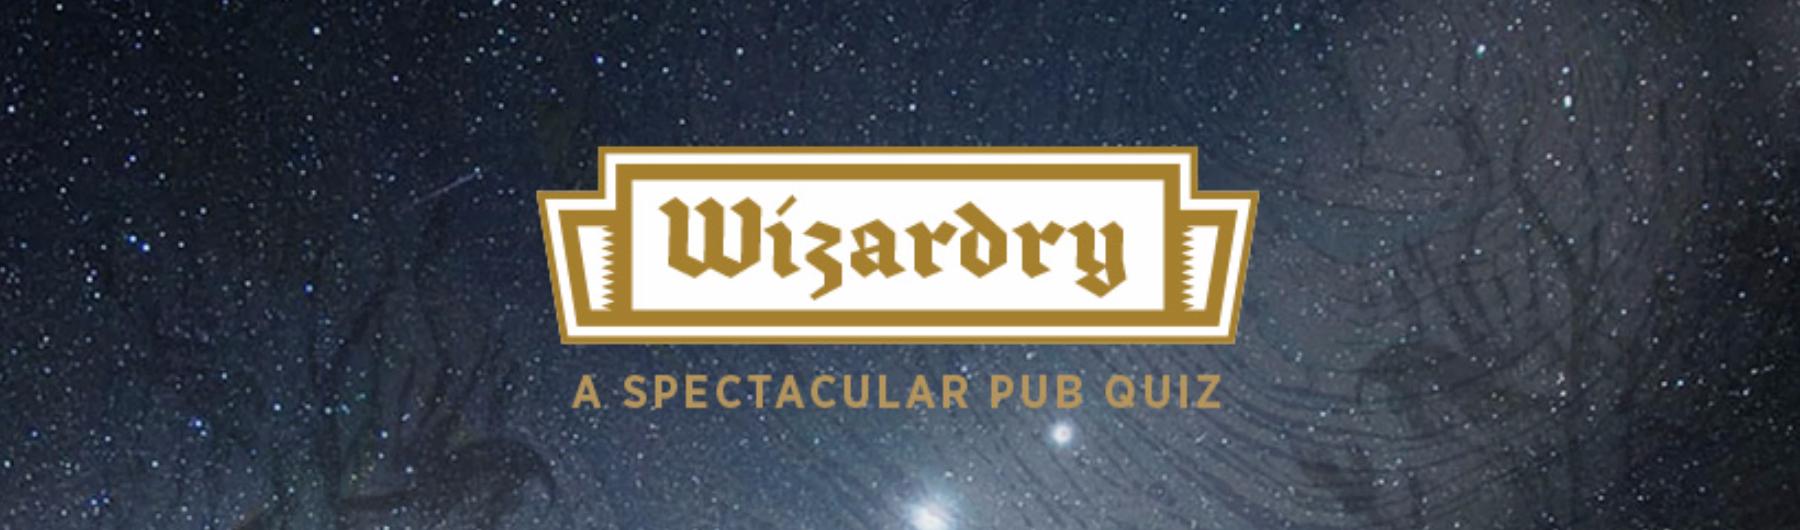 Postponed - Wizardry Quiz - for the Loyal (Brighton) *FESTIVE EDITION*